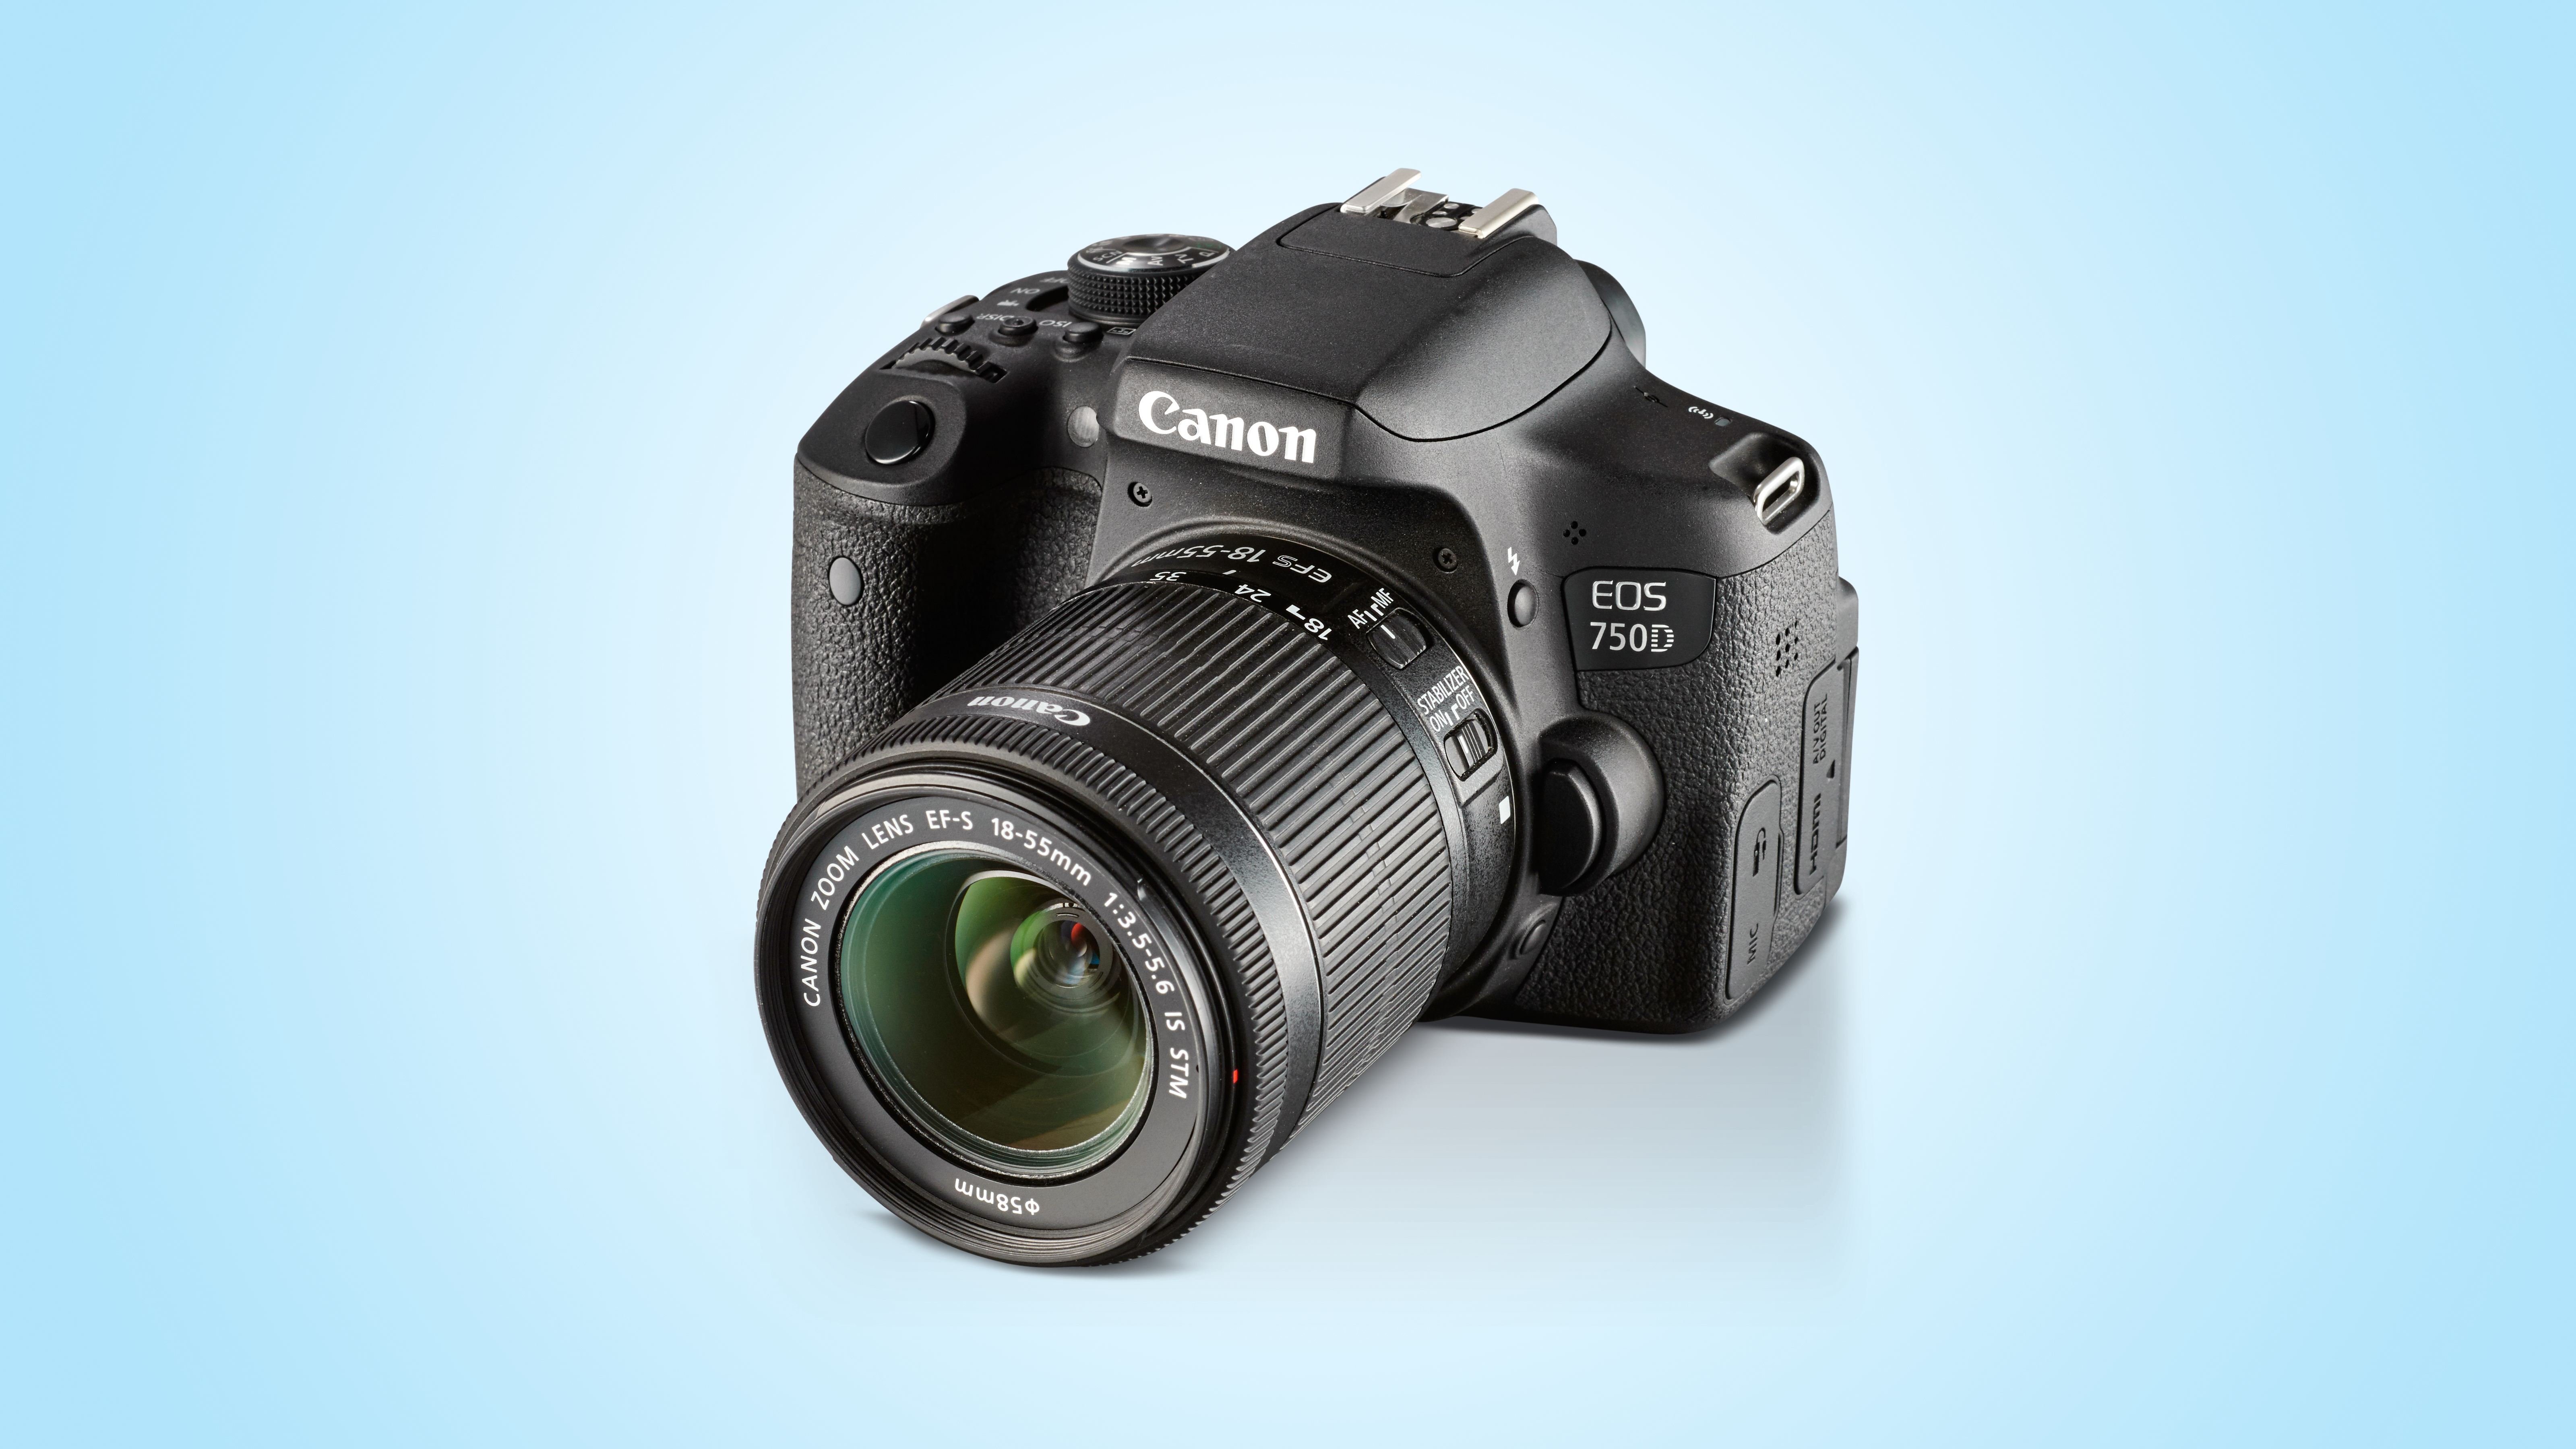 Canon EOS Rebel T6i / EOS 750D